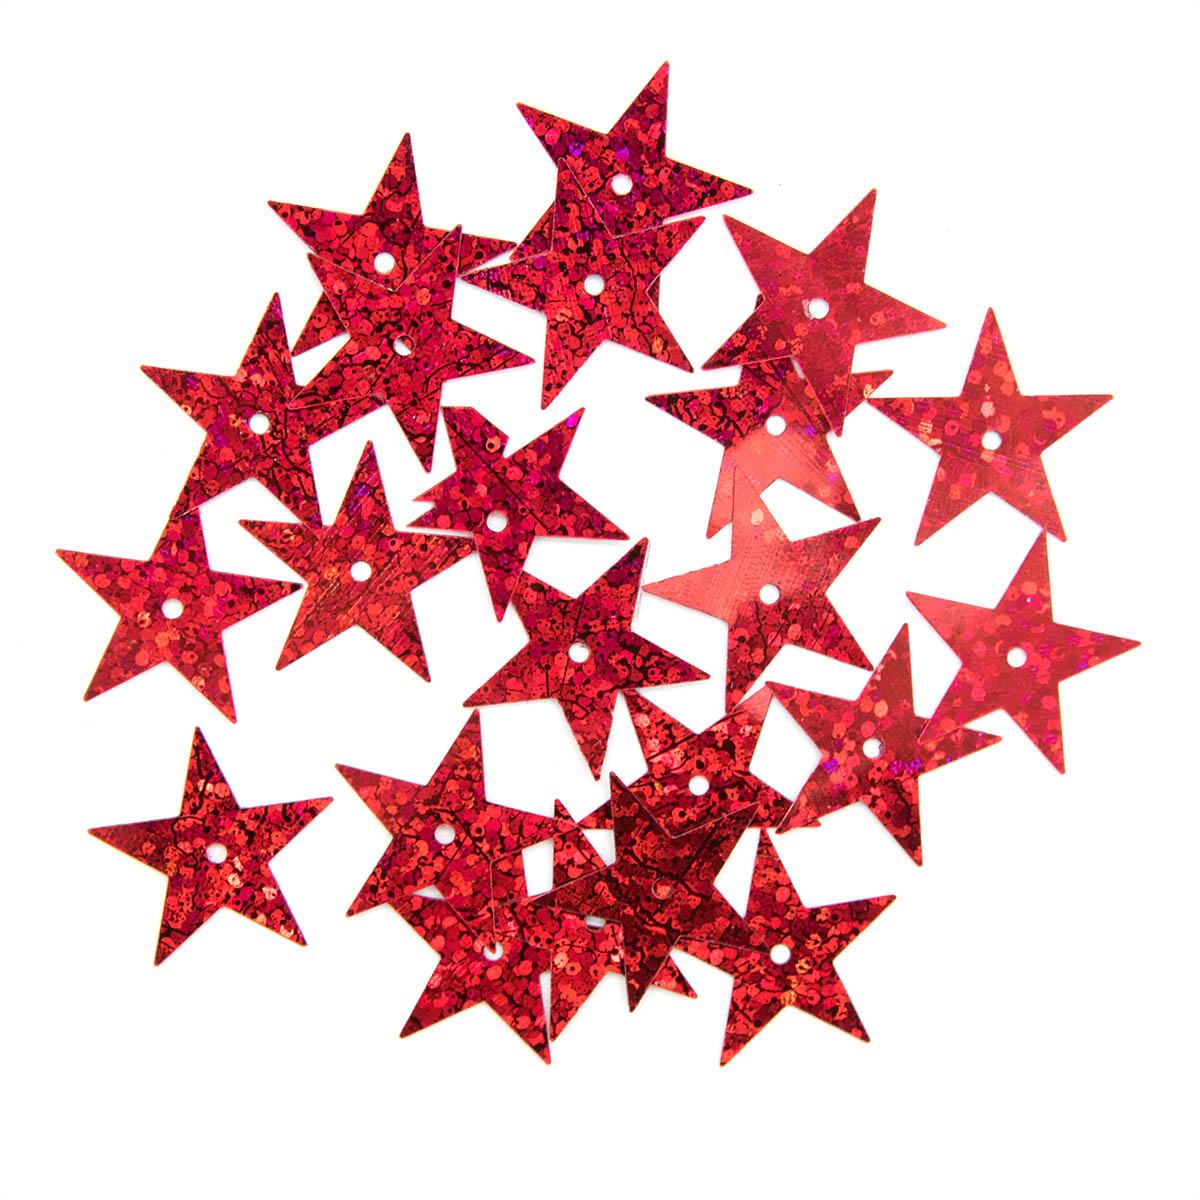 Пайетки 'звездочки', 20 мм, упак./10 гр., 'Астра'